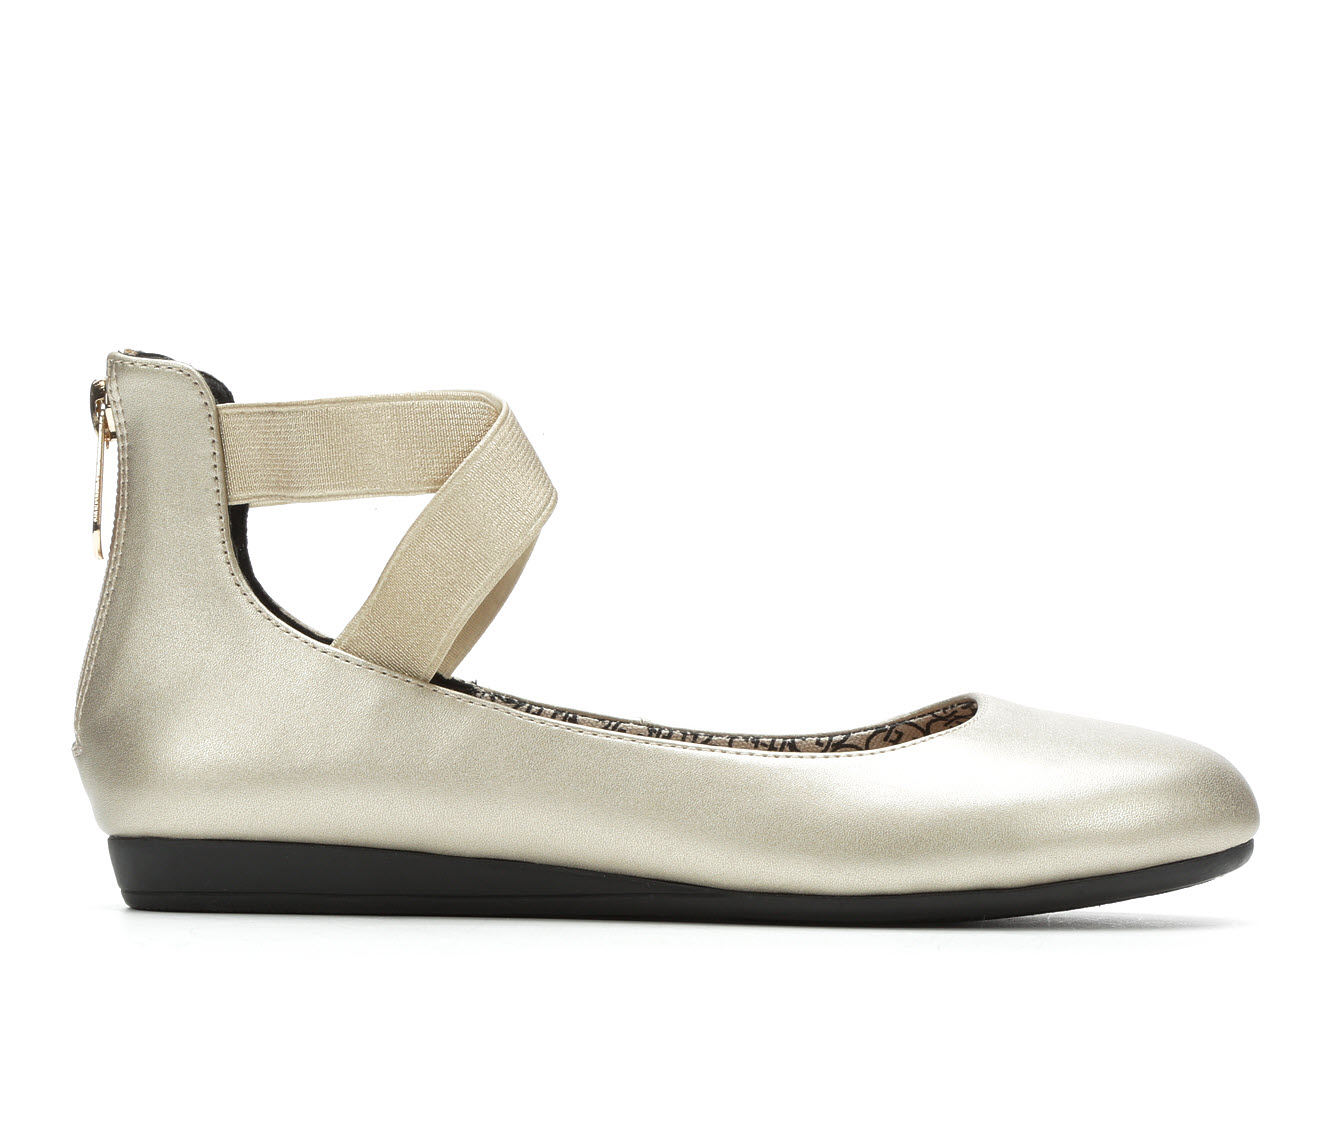 Daisy Fuentes Russo Women's Shoe (Gold Canvas)